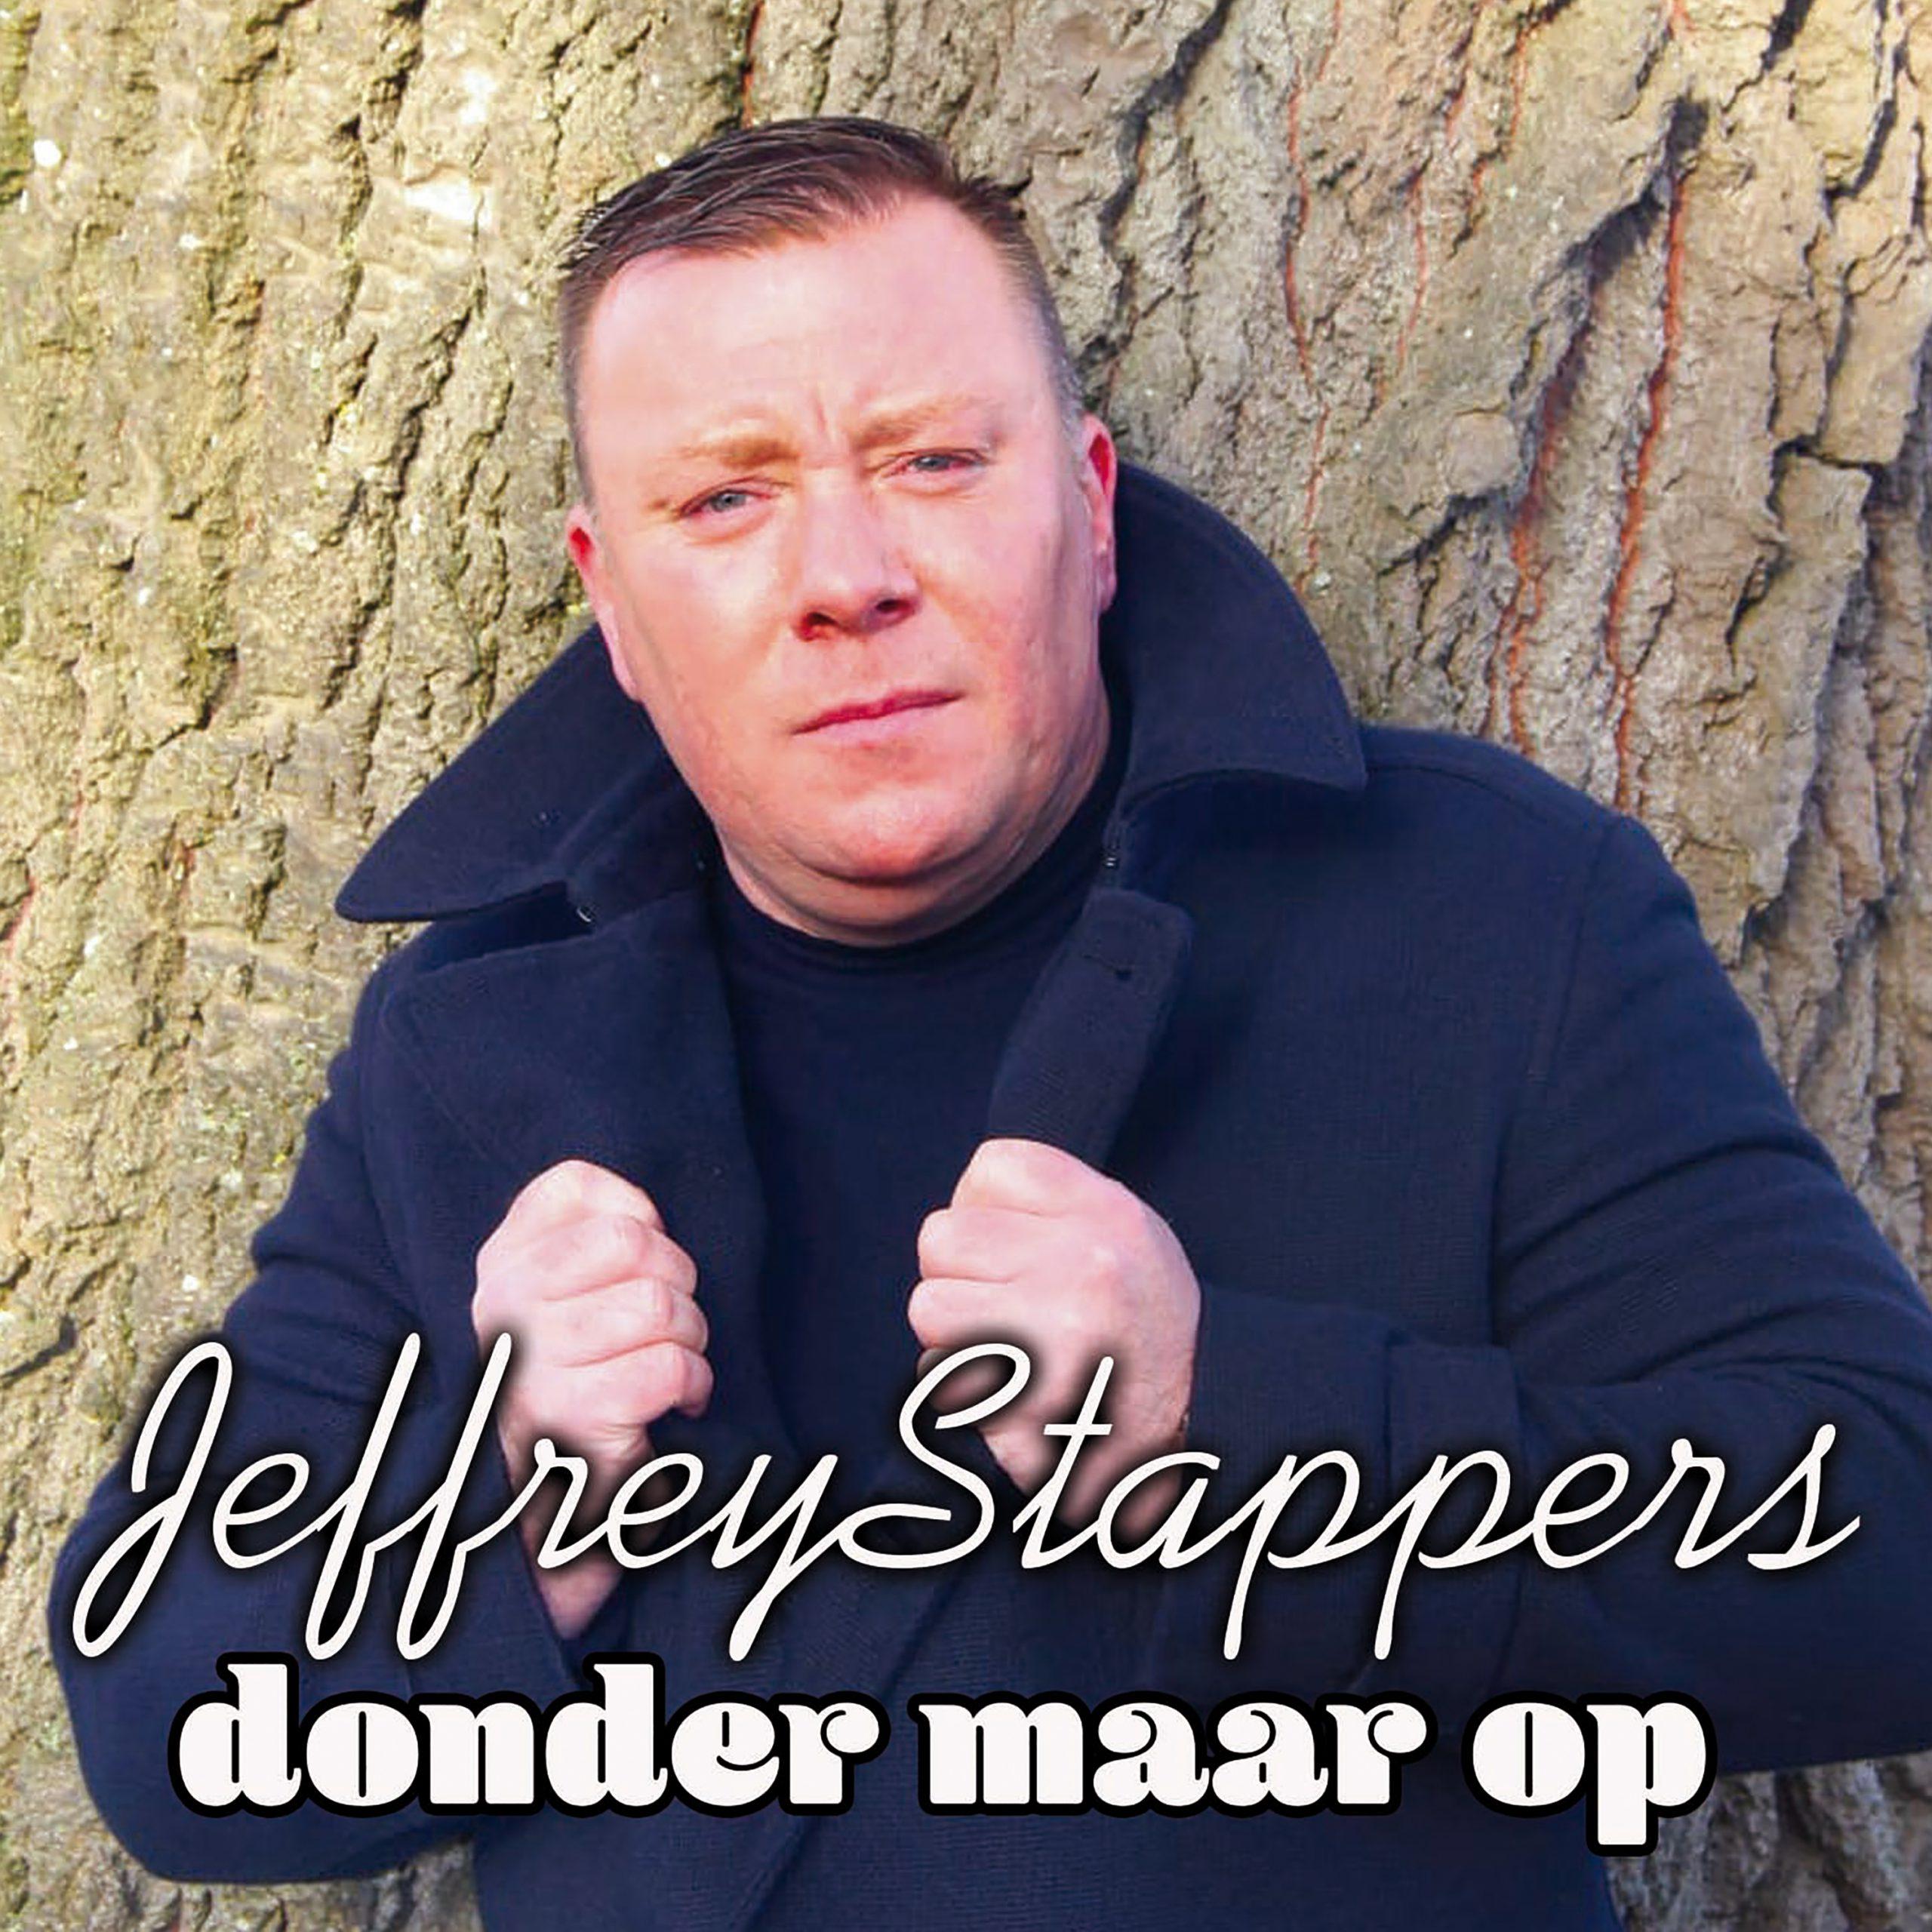 Jeffrey Stappers - Donder maar op